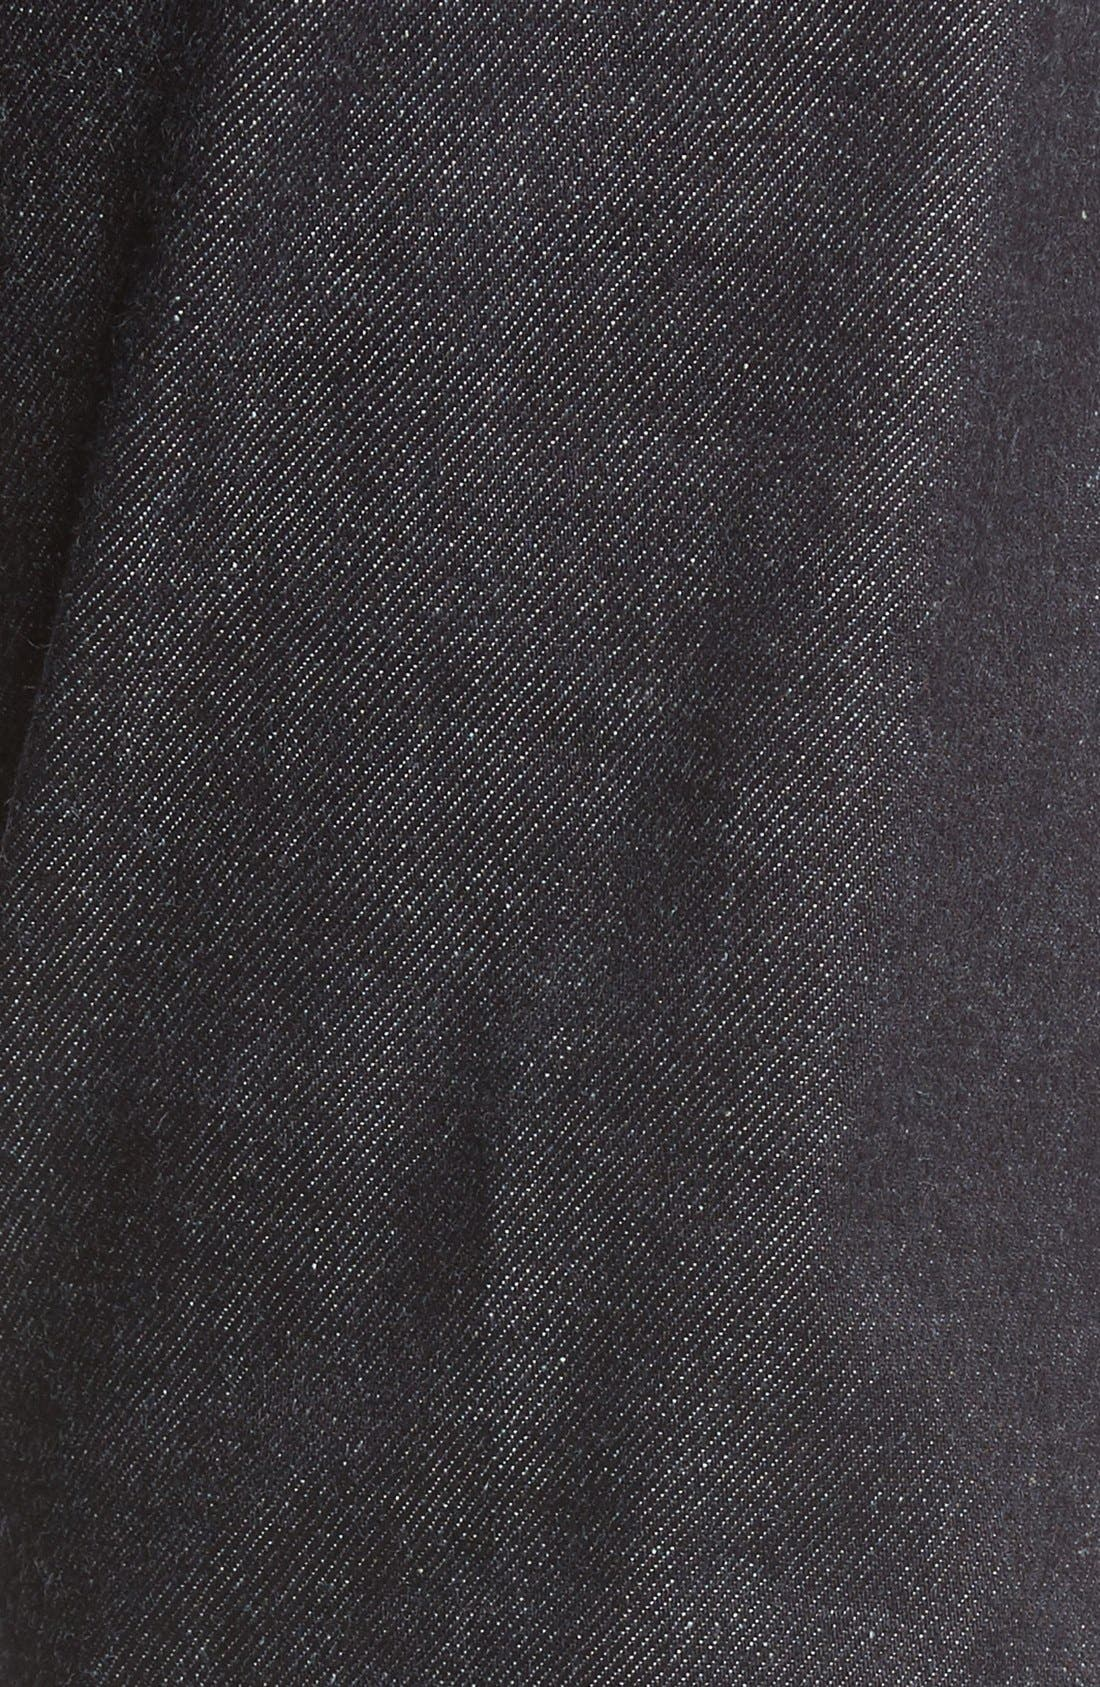 UB422 Selvedge Skinny Fit Jeans,                             Alternate thumbnail 5, color,                             401